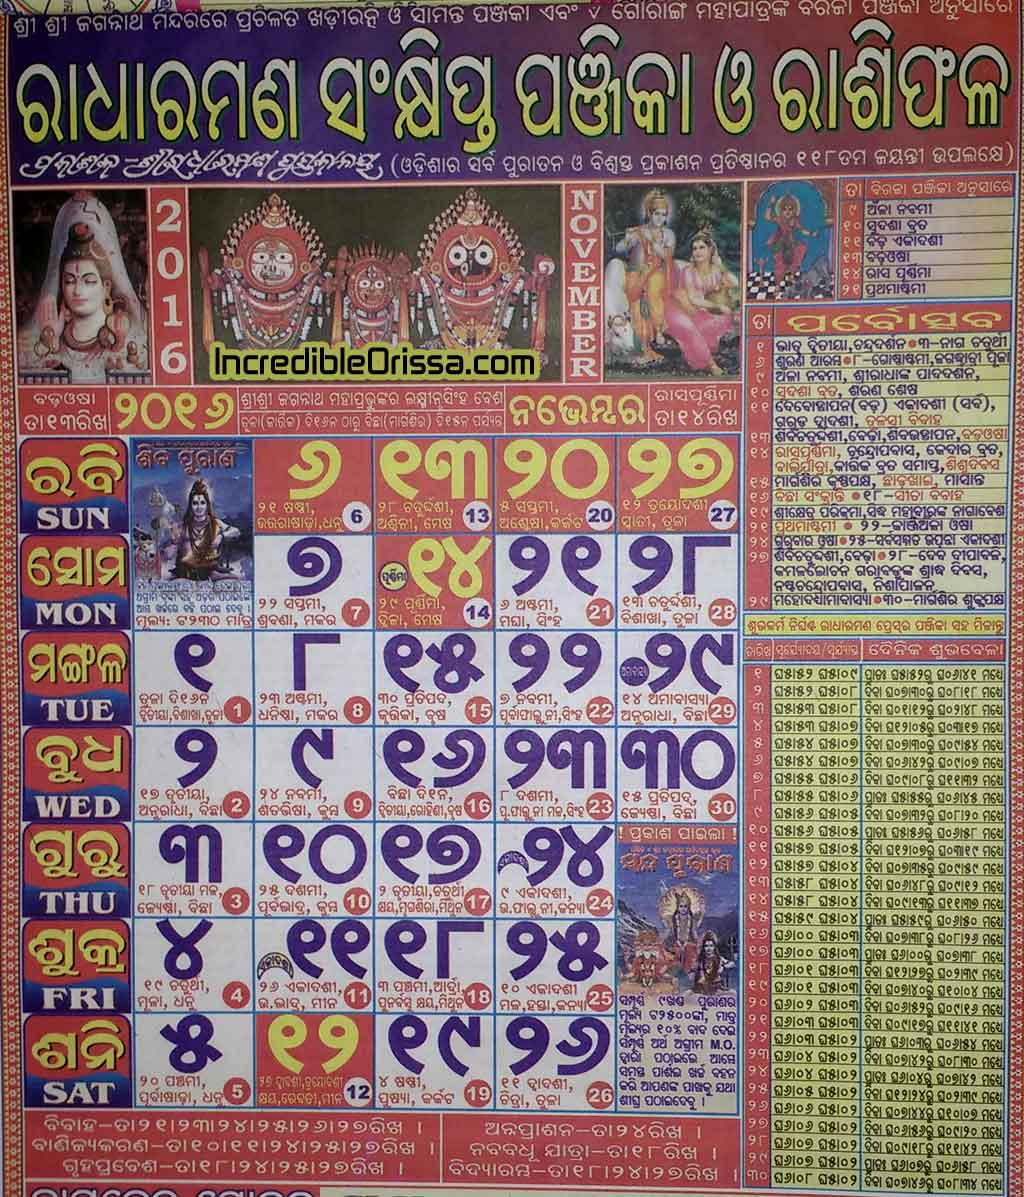 Odia Calendar 2016 - Oriya Radharaman, Kohinoor Pdf Download